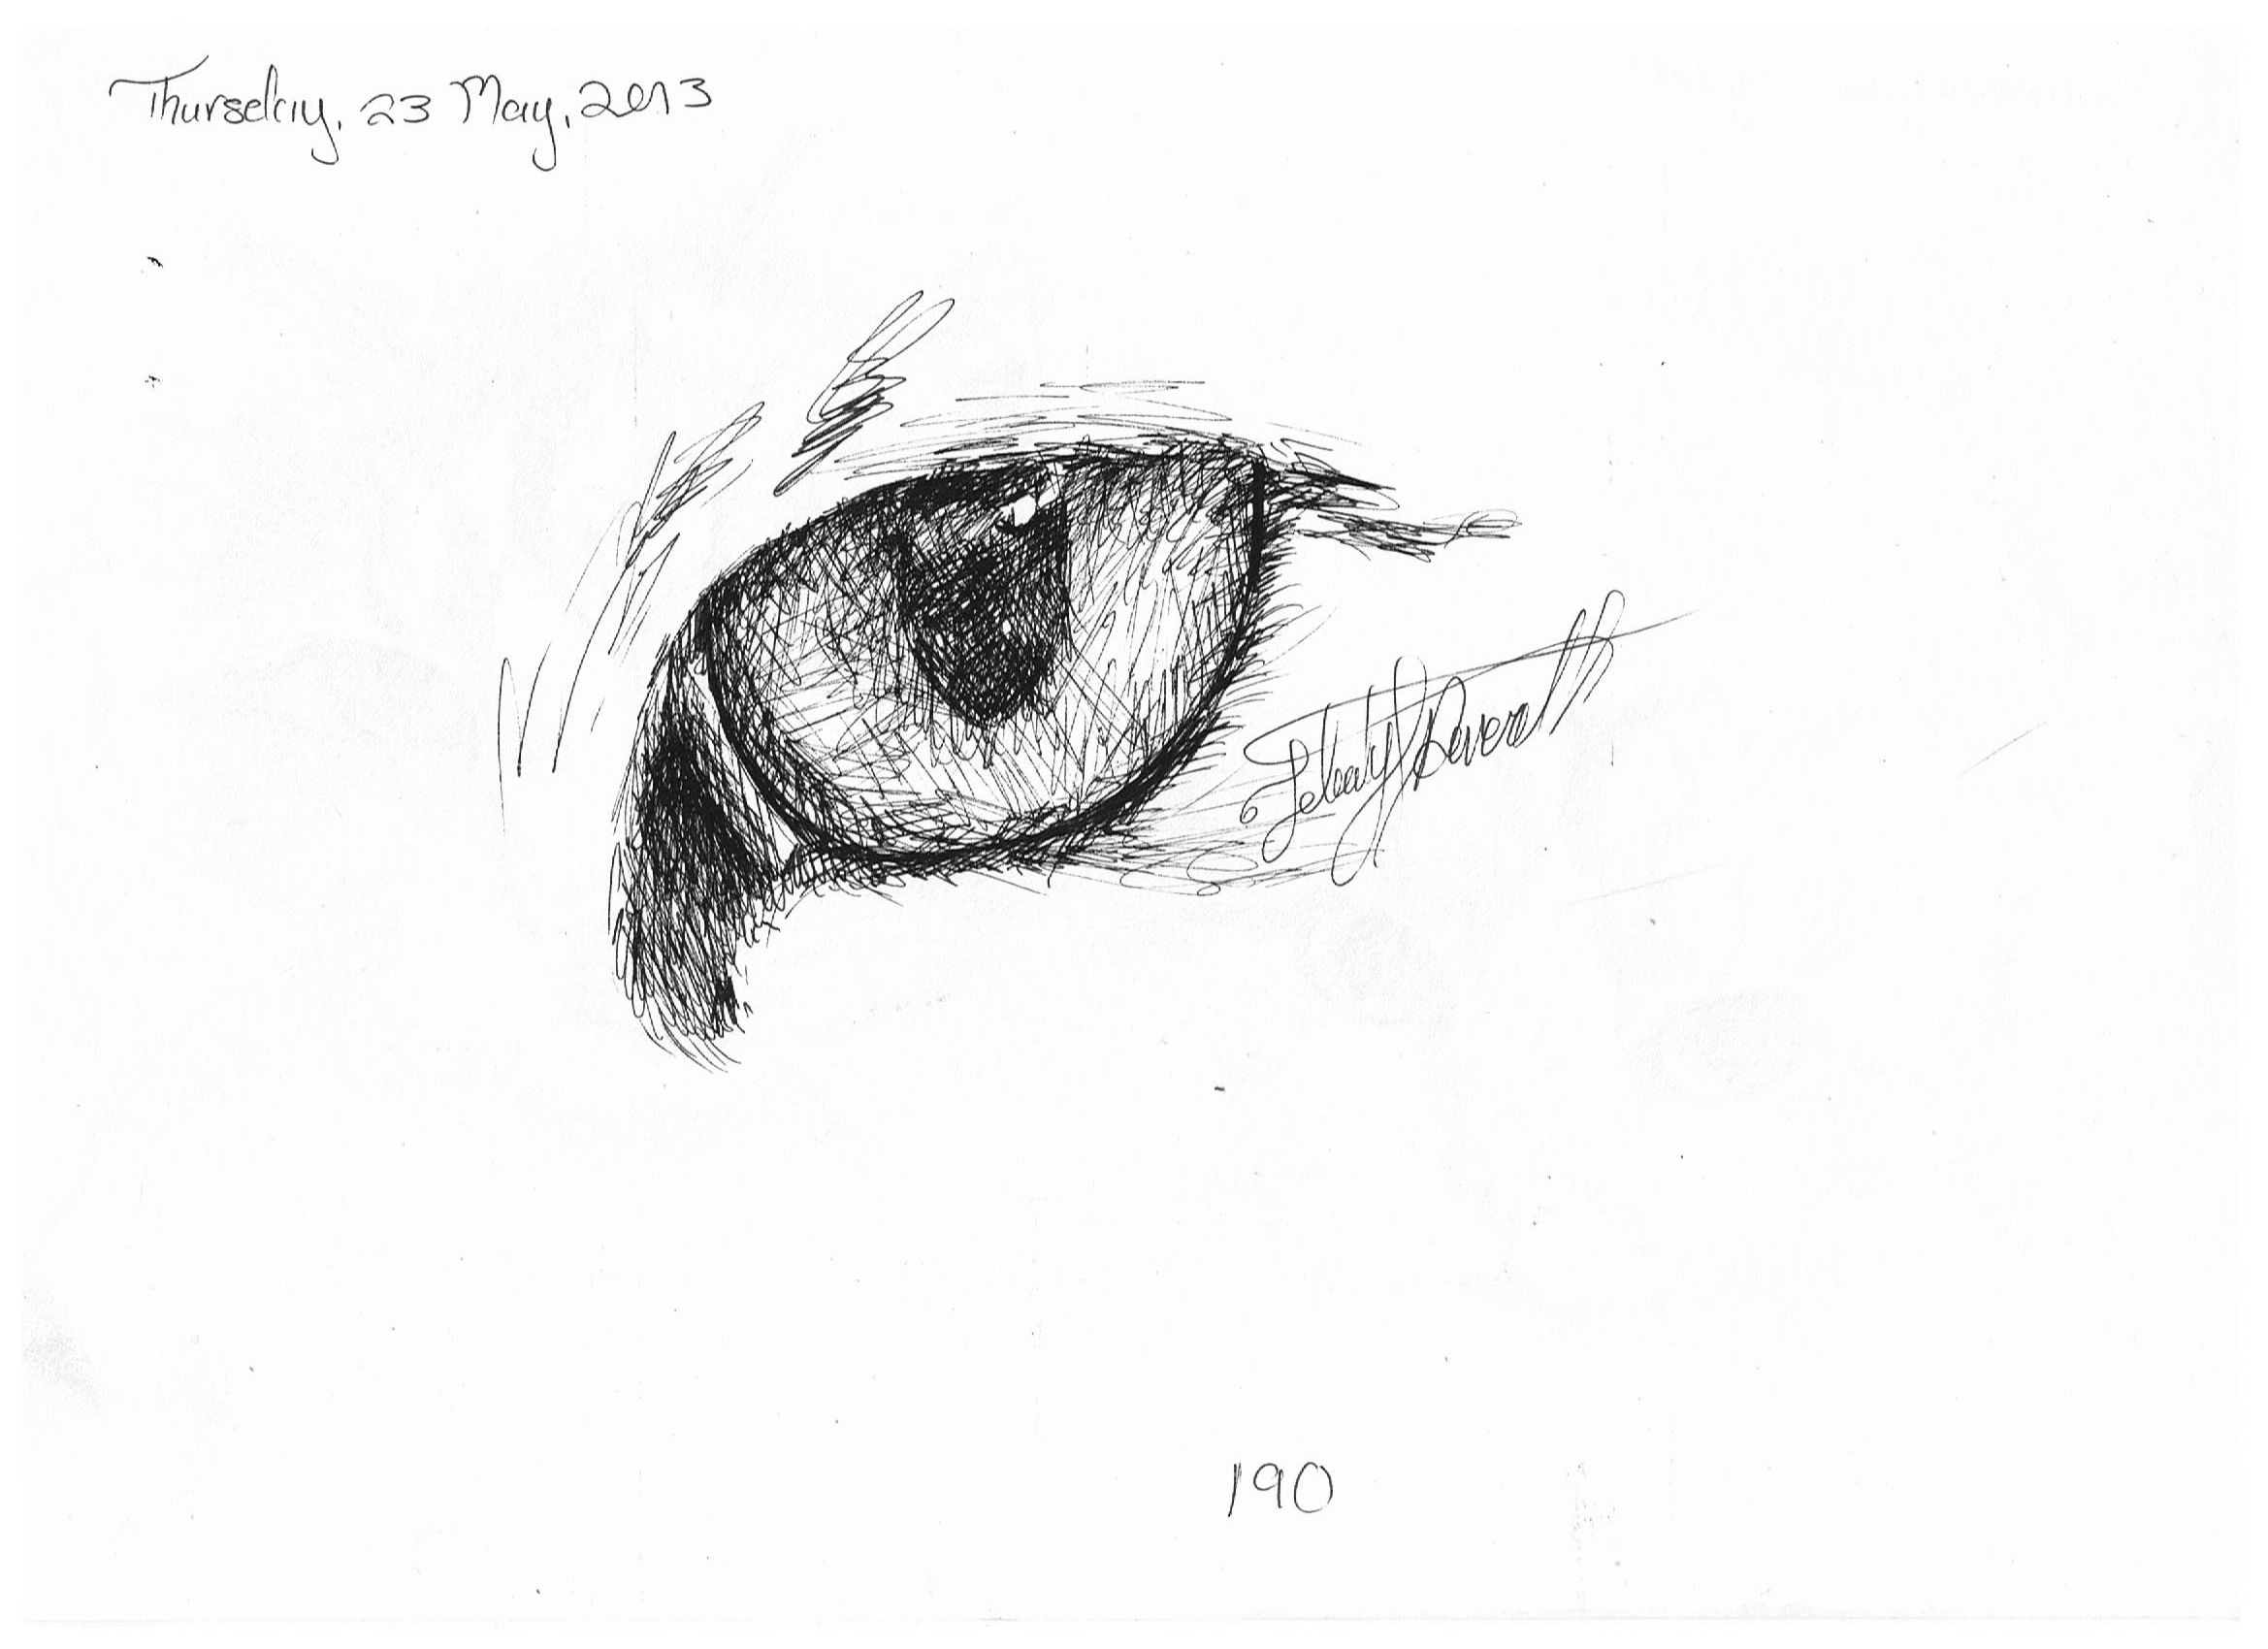 Line Drawing Eye : Cat eye pen drawing by felicity deverell things i love